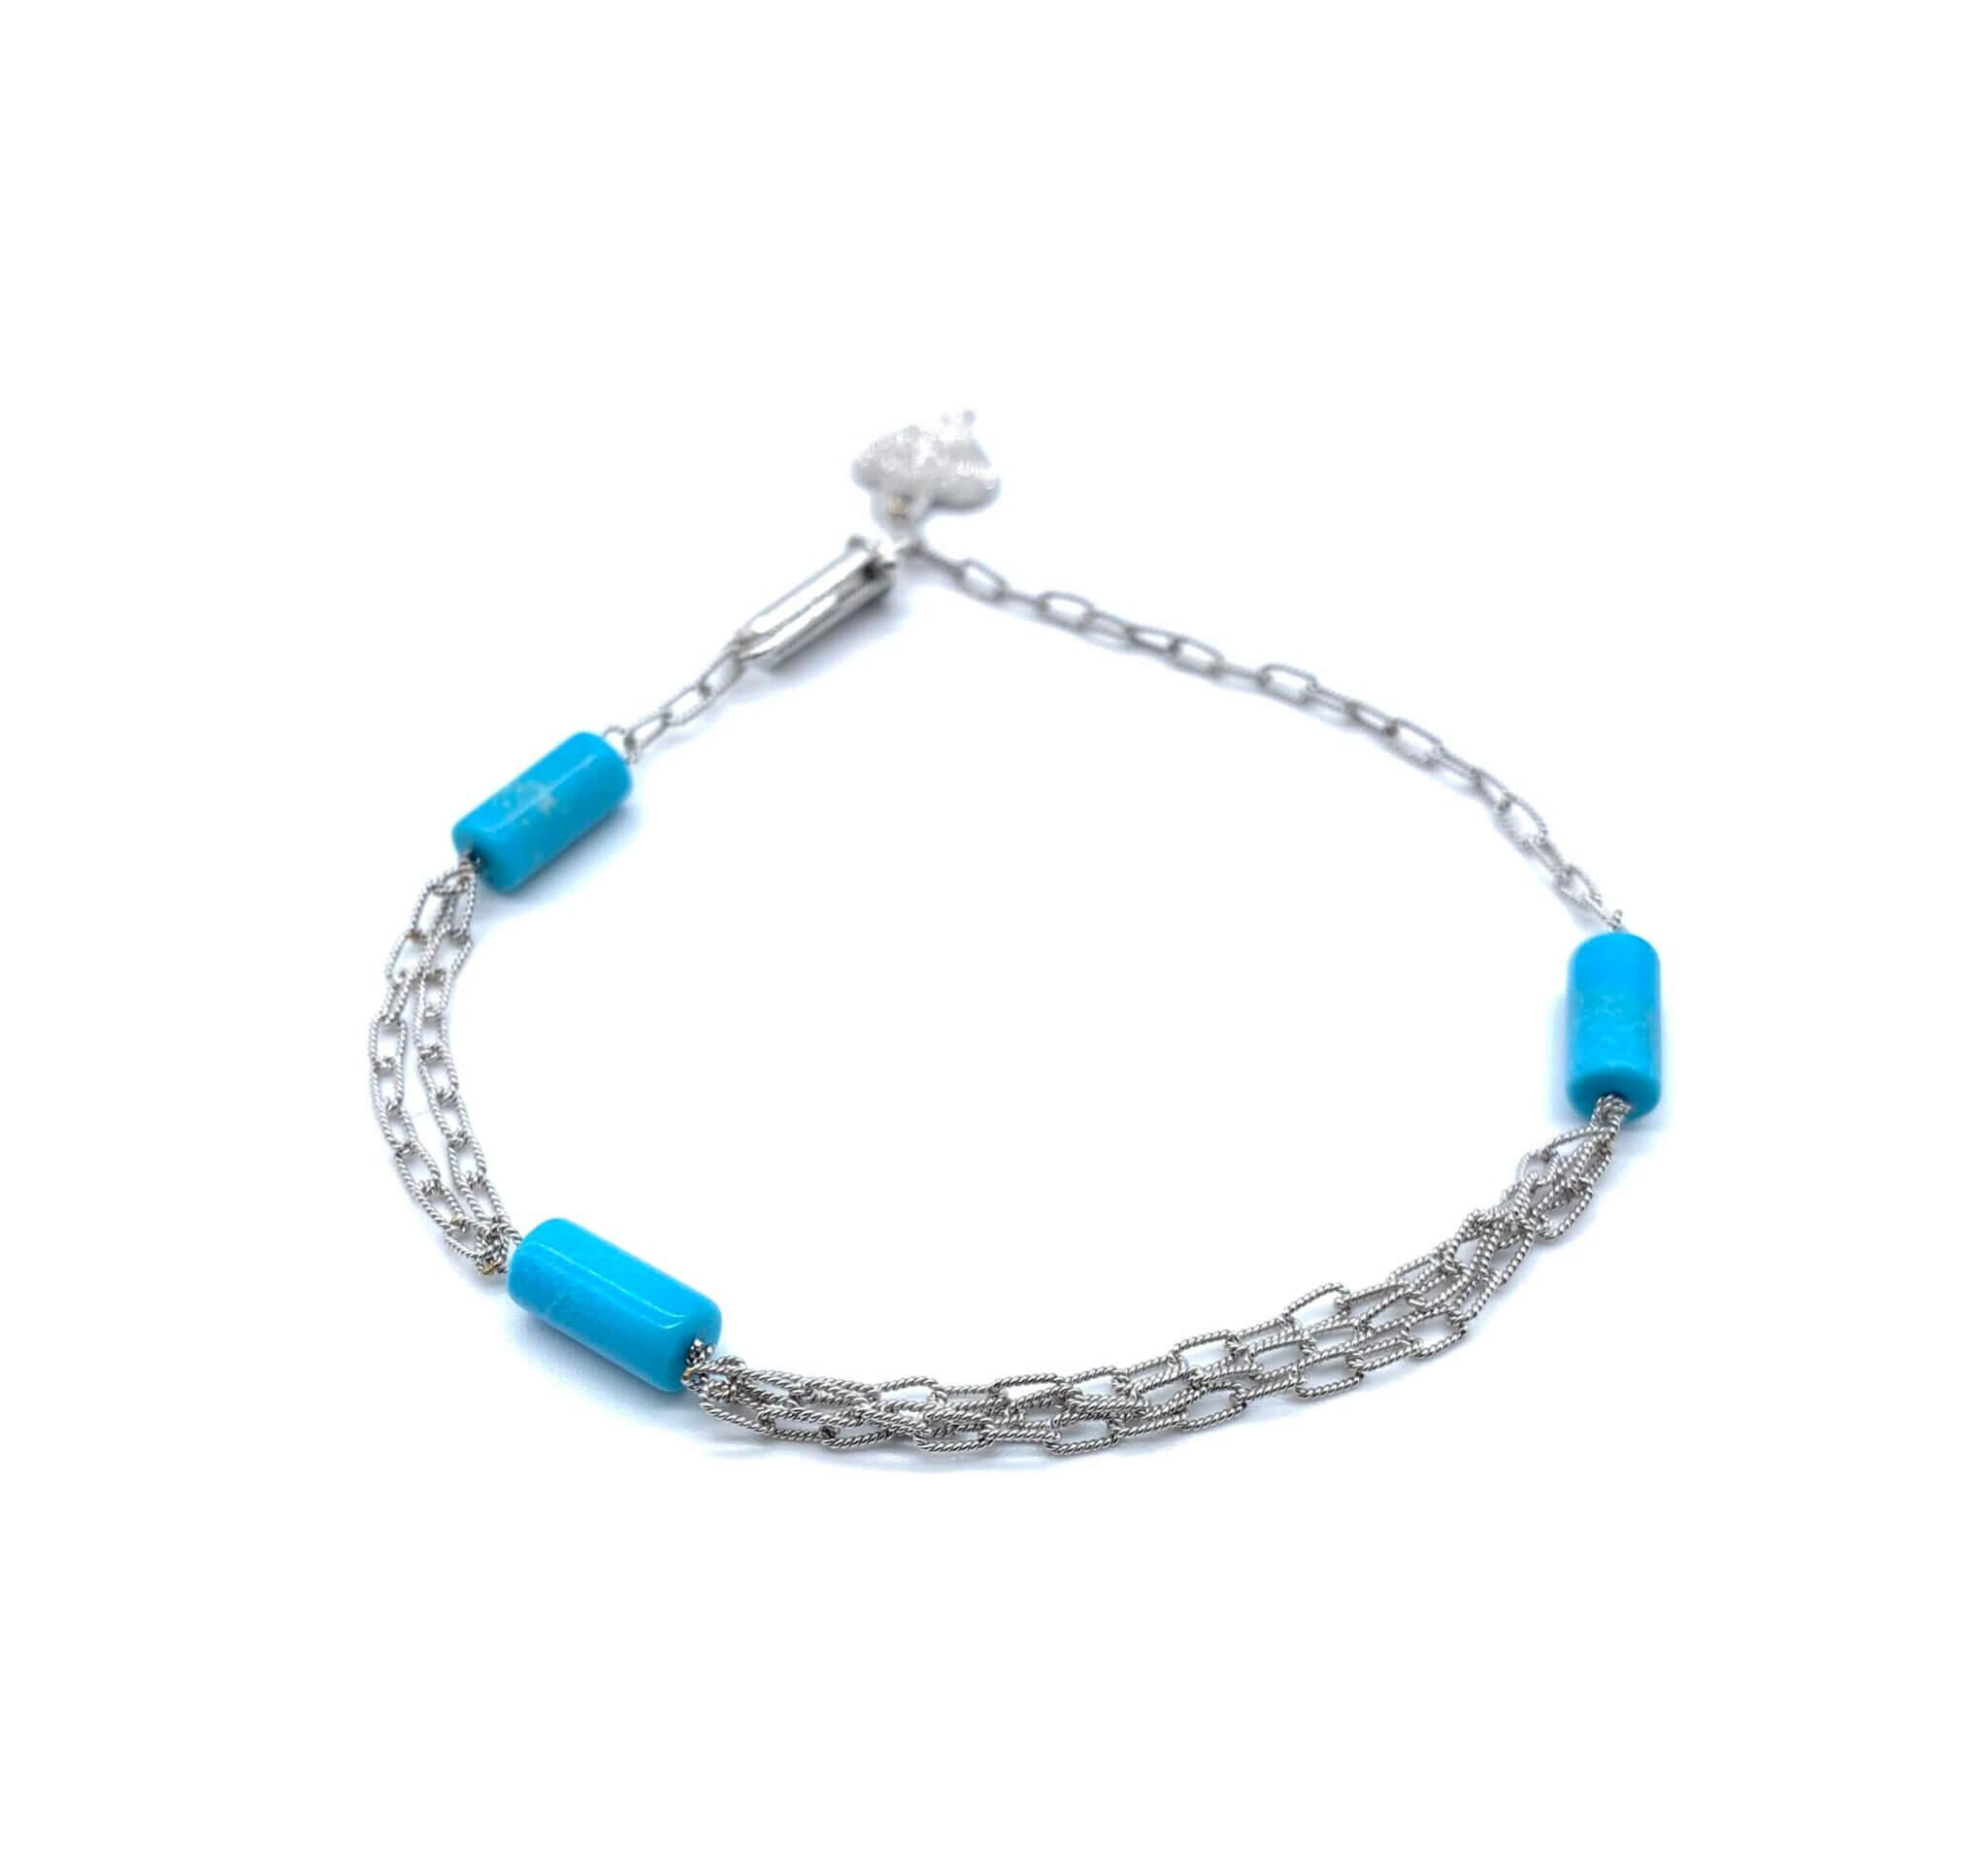 Caterina Murino bracelet or turquoise